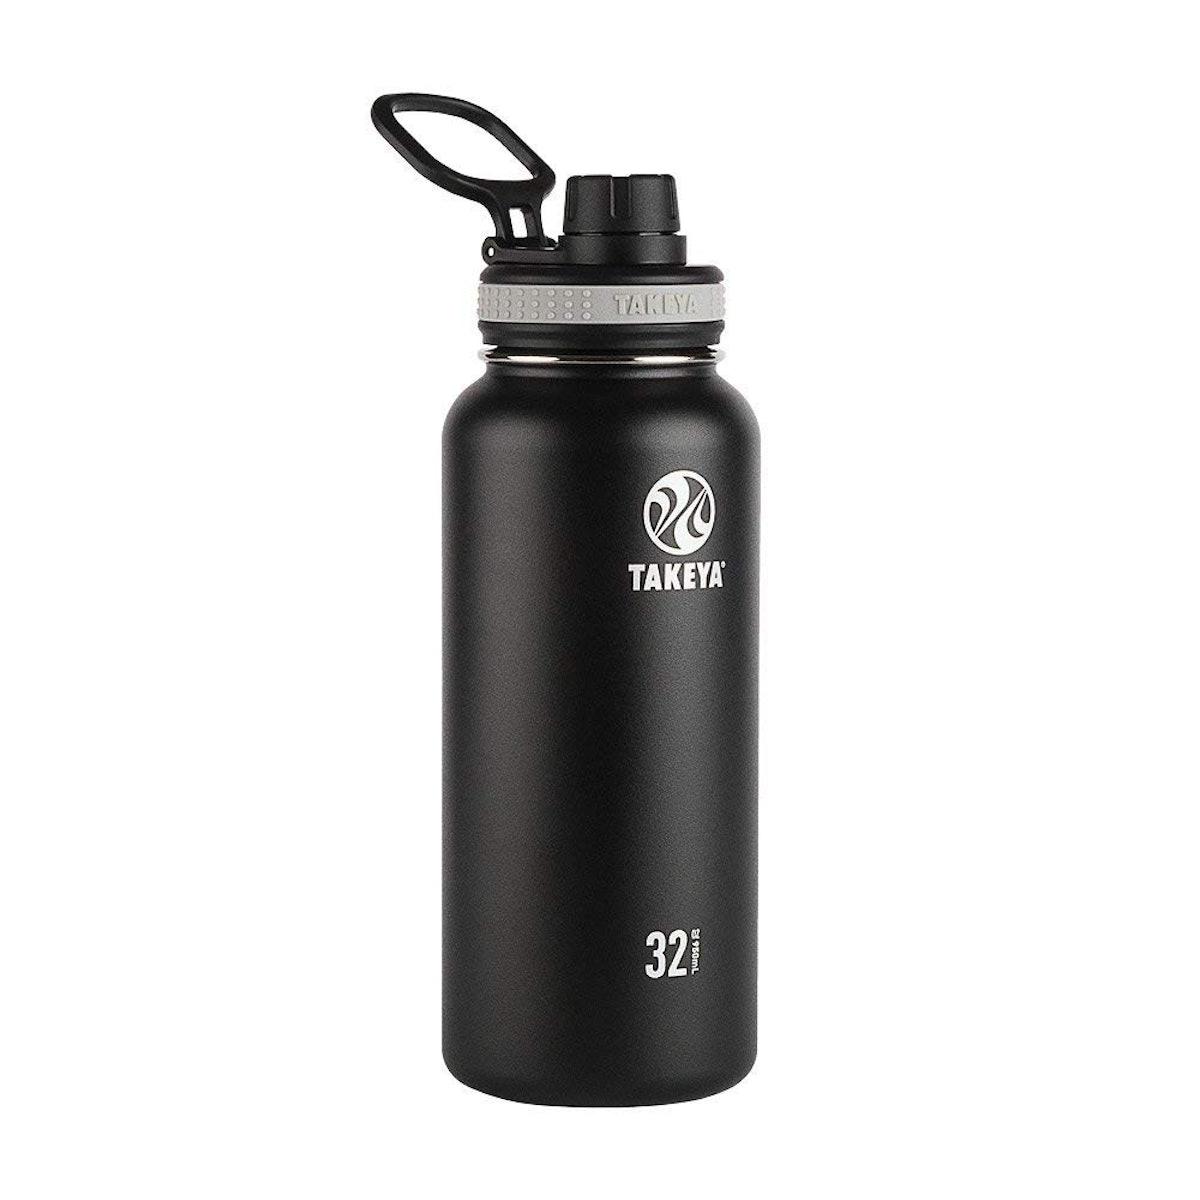 Takeya Originals Vacuum-Insulated Stainless Steel Water Bottle